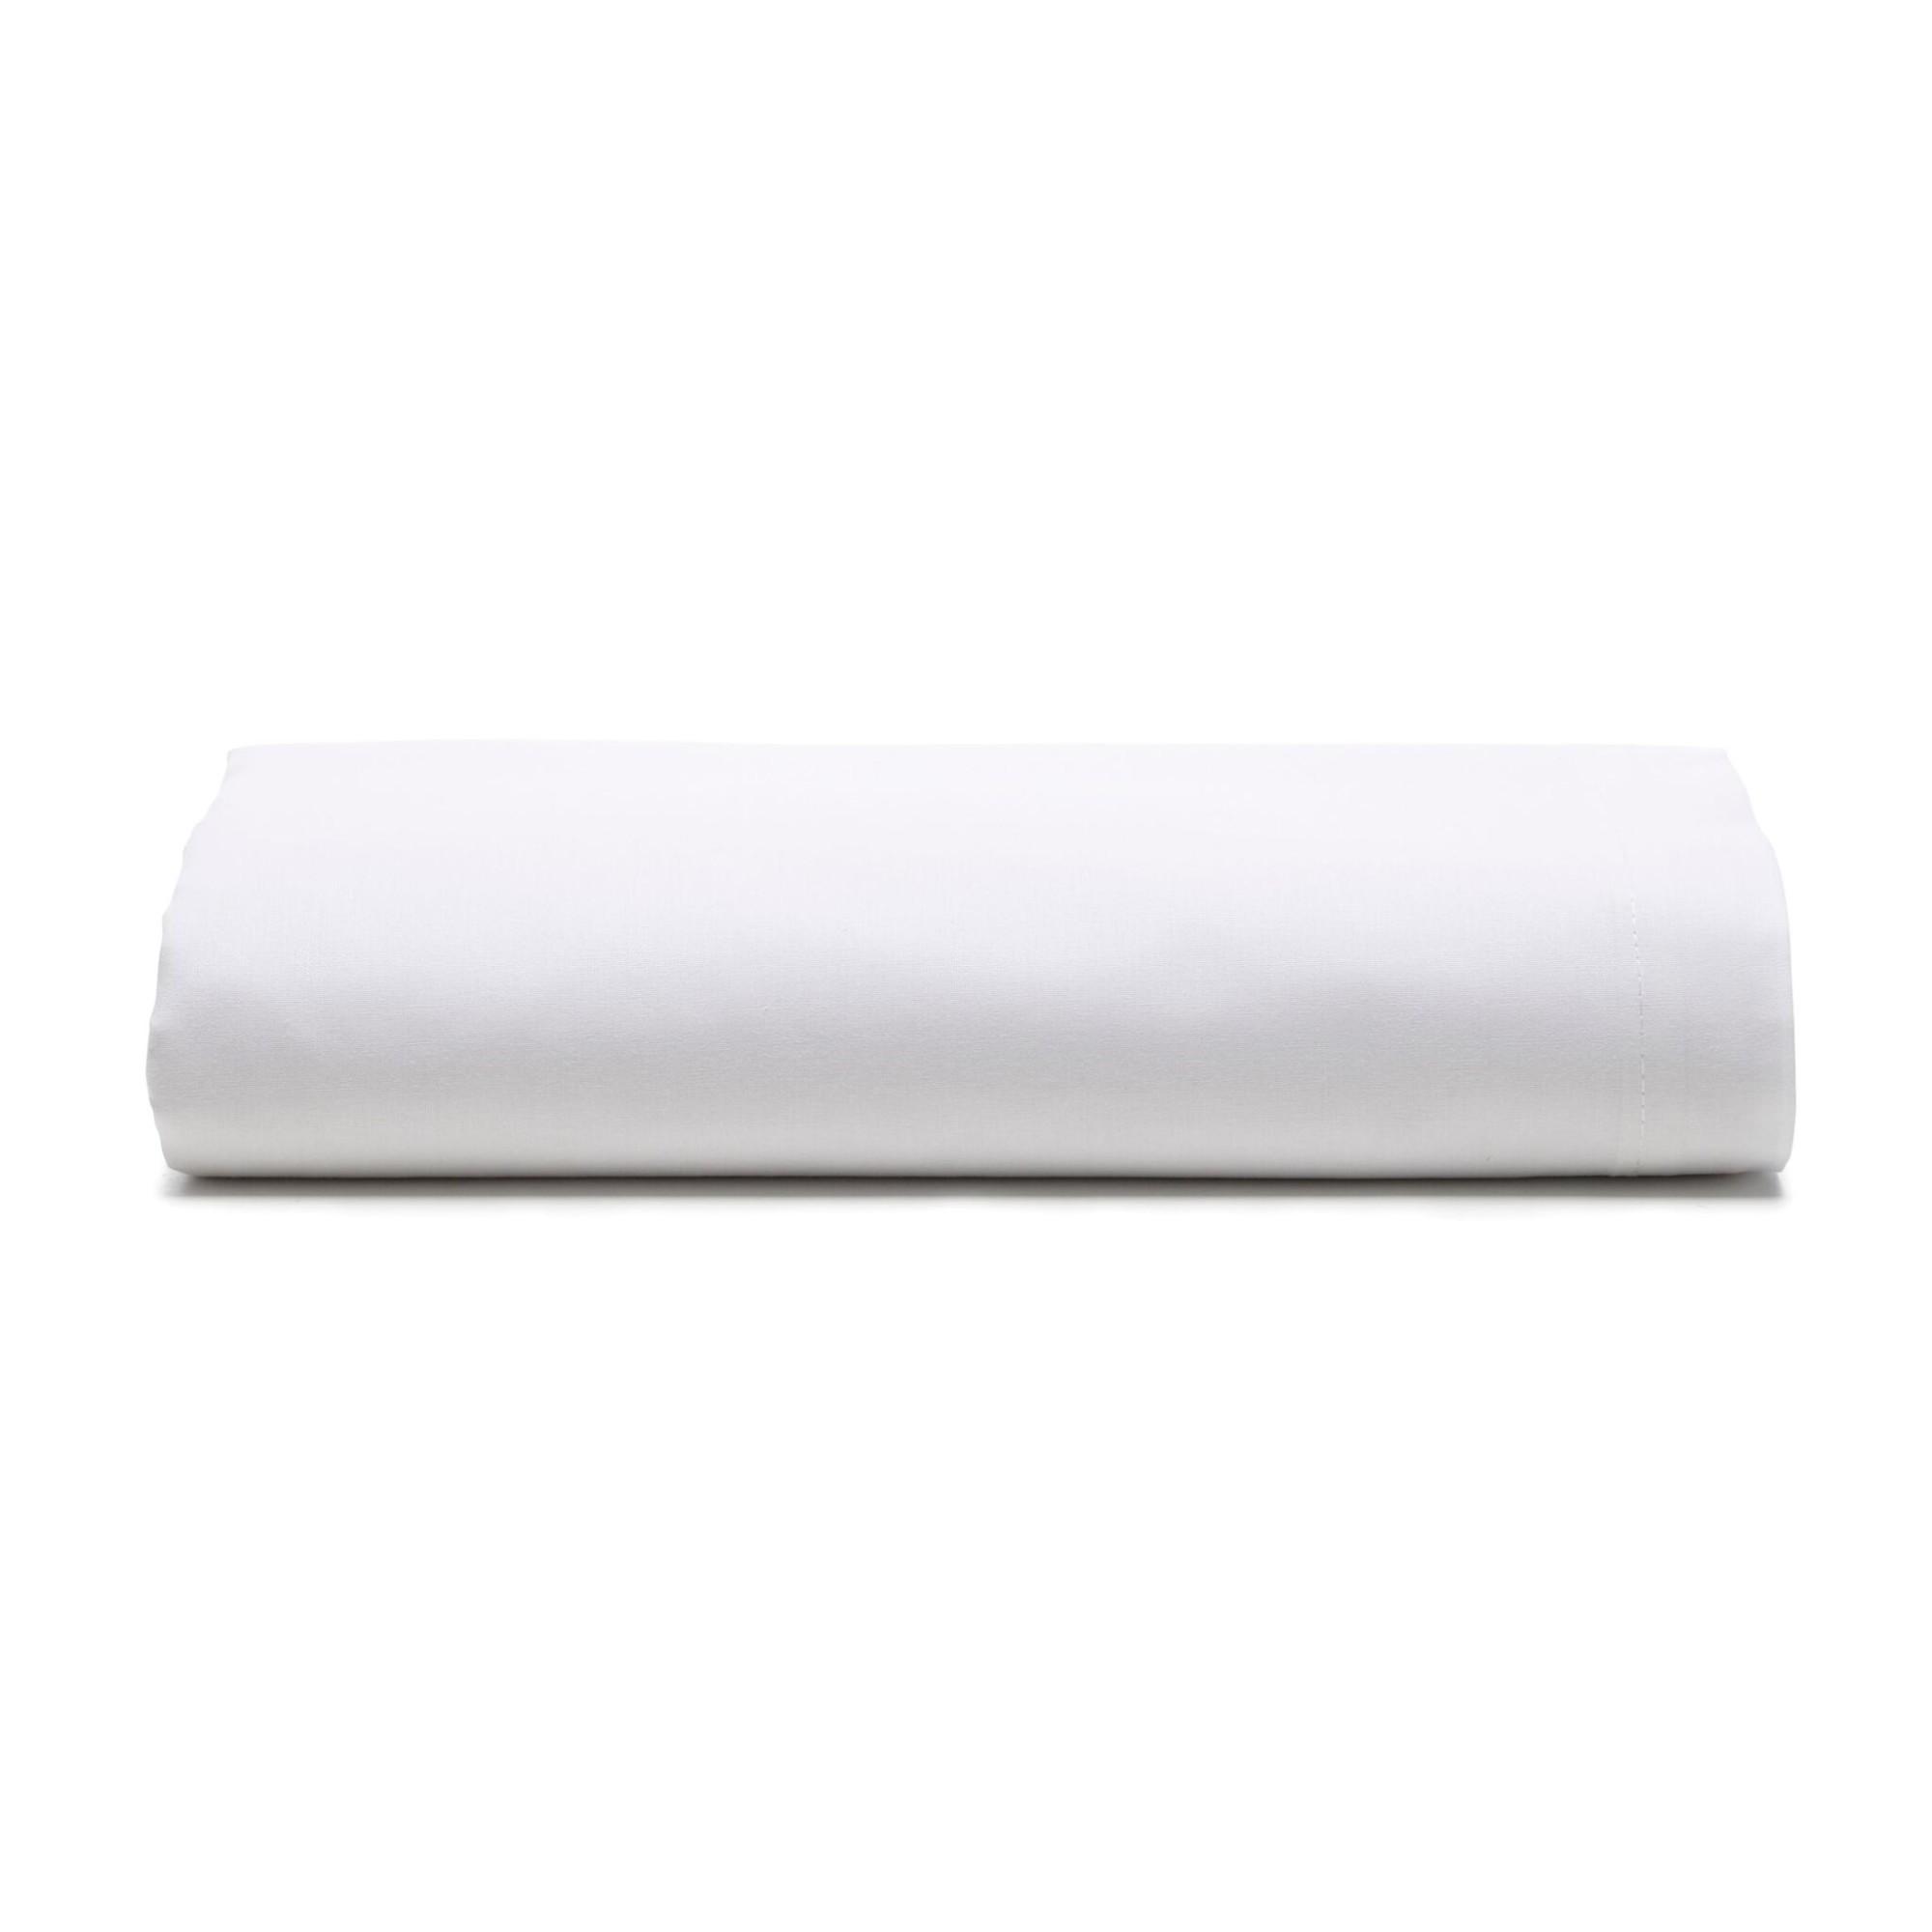 Lencol Casal Royal sem Elastico 100 Algodao Branco - Santista